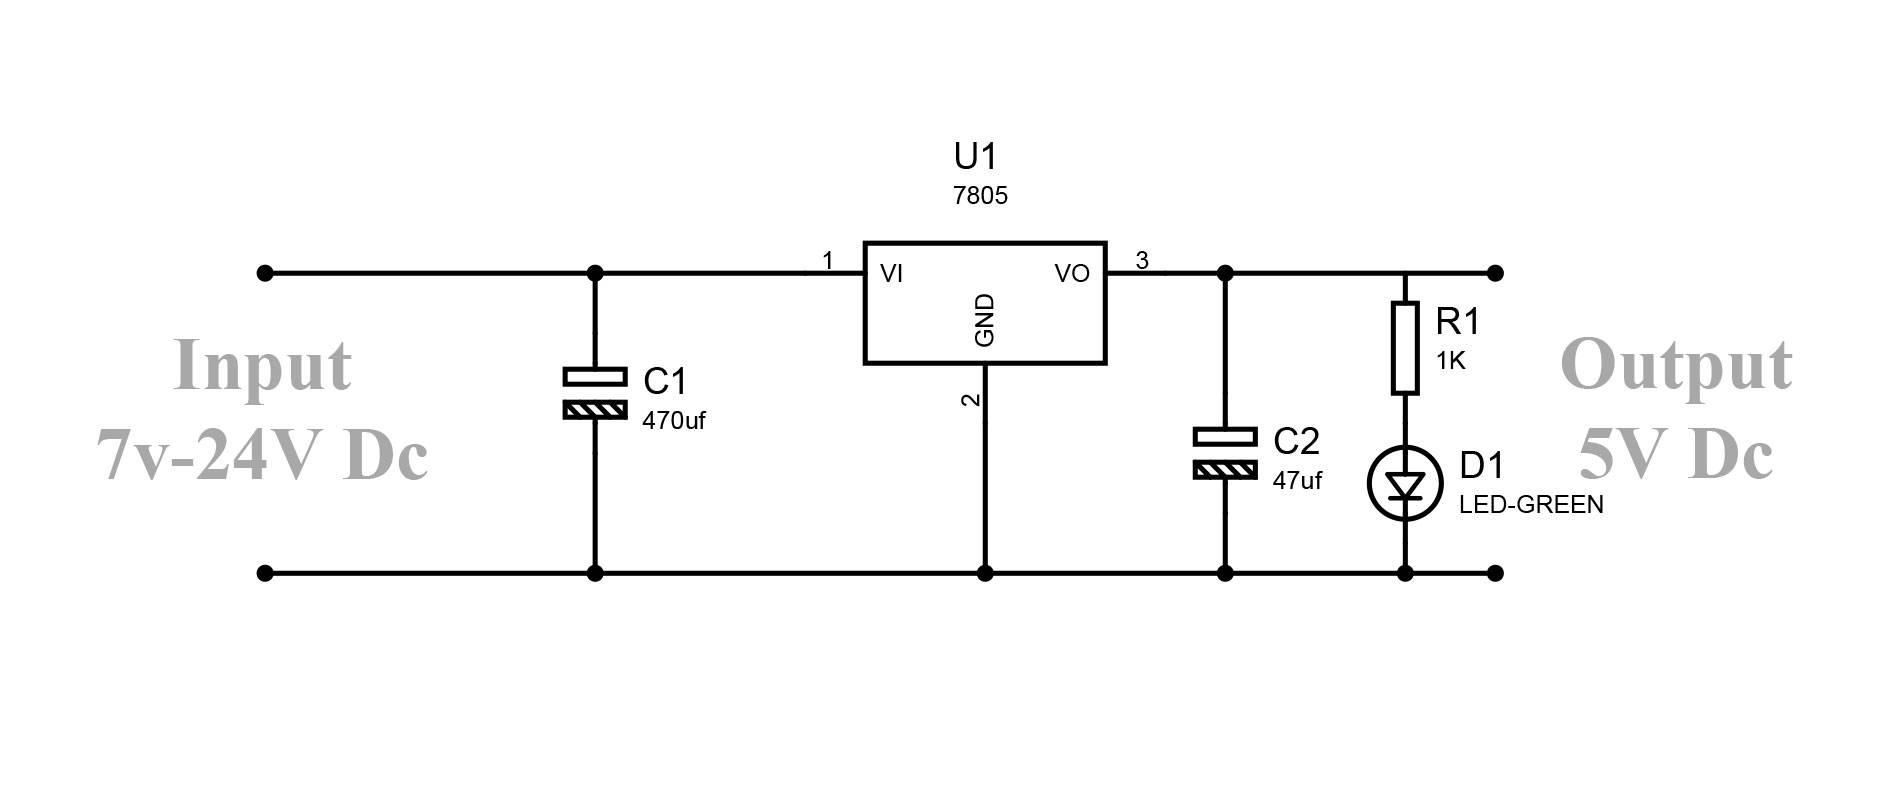 hight resolution of fig regulator lm7805 circuit diagram